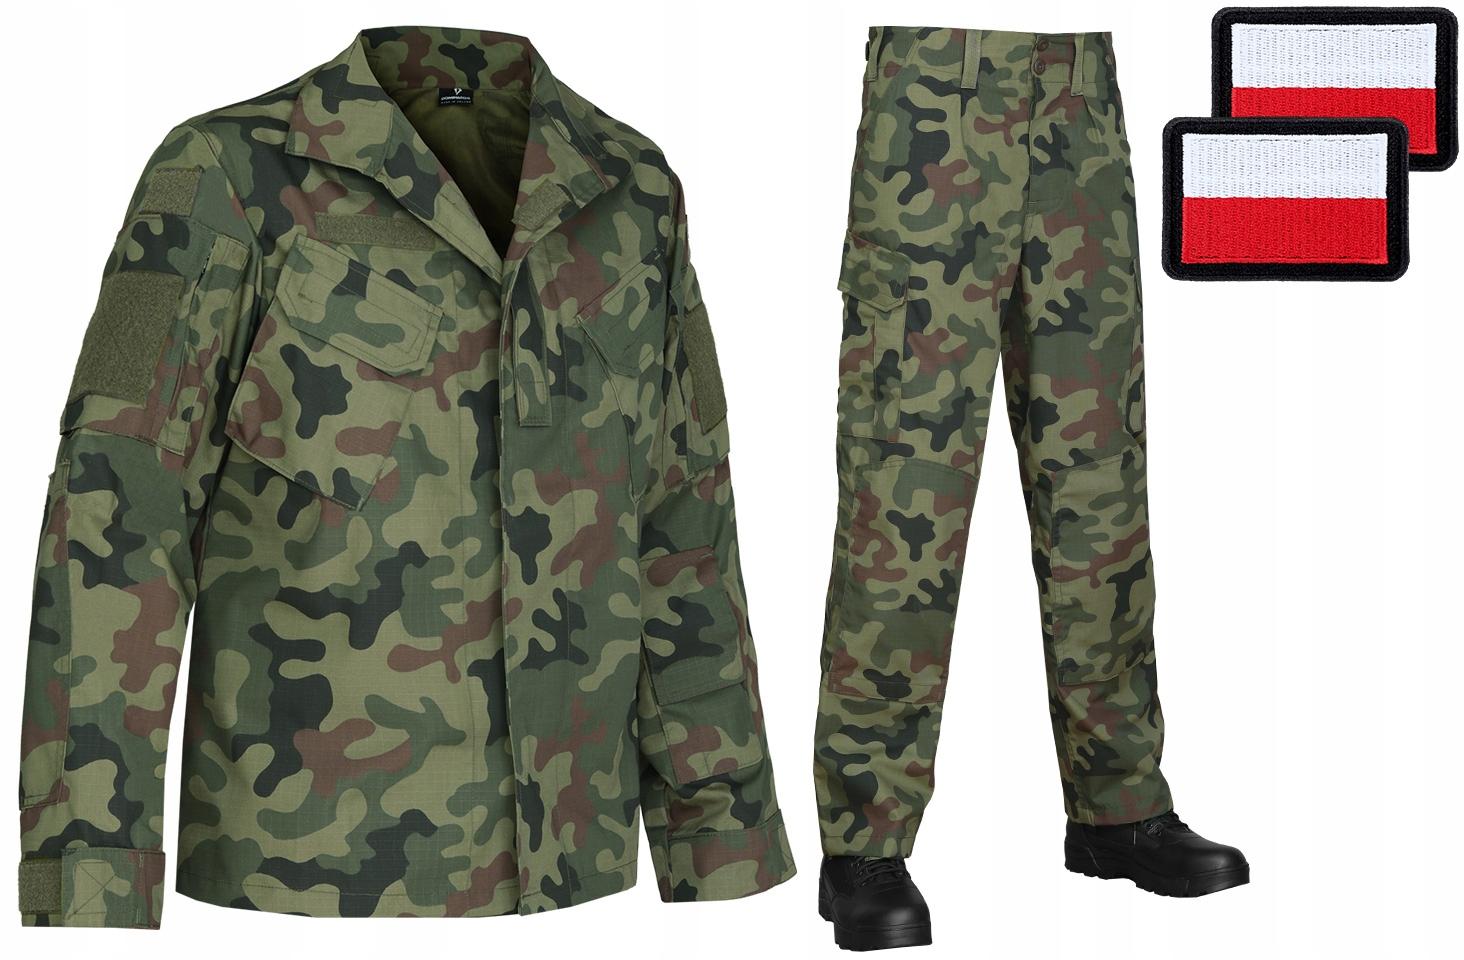 Dominator Polski Mundur Wojskowy Mon Wz93 Komplet 9480429731 Allegro Pl